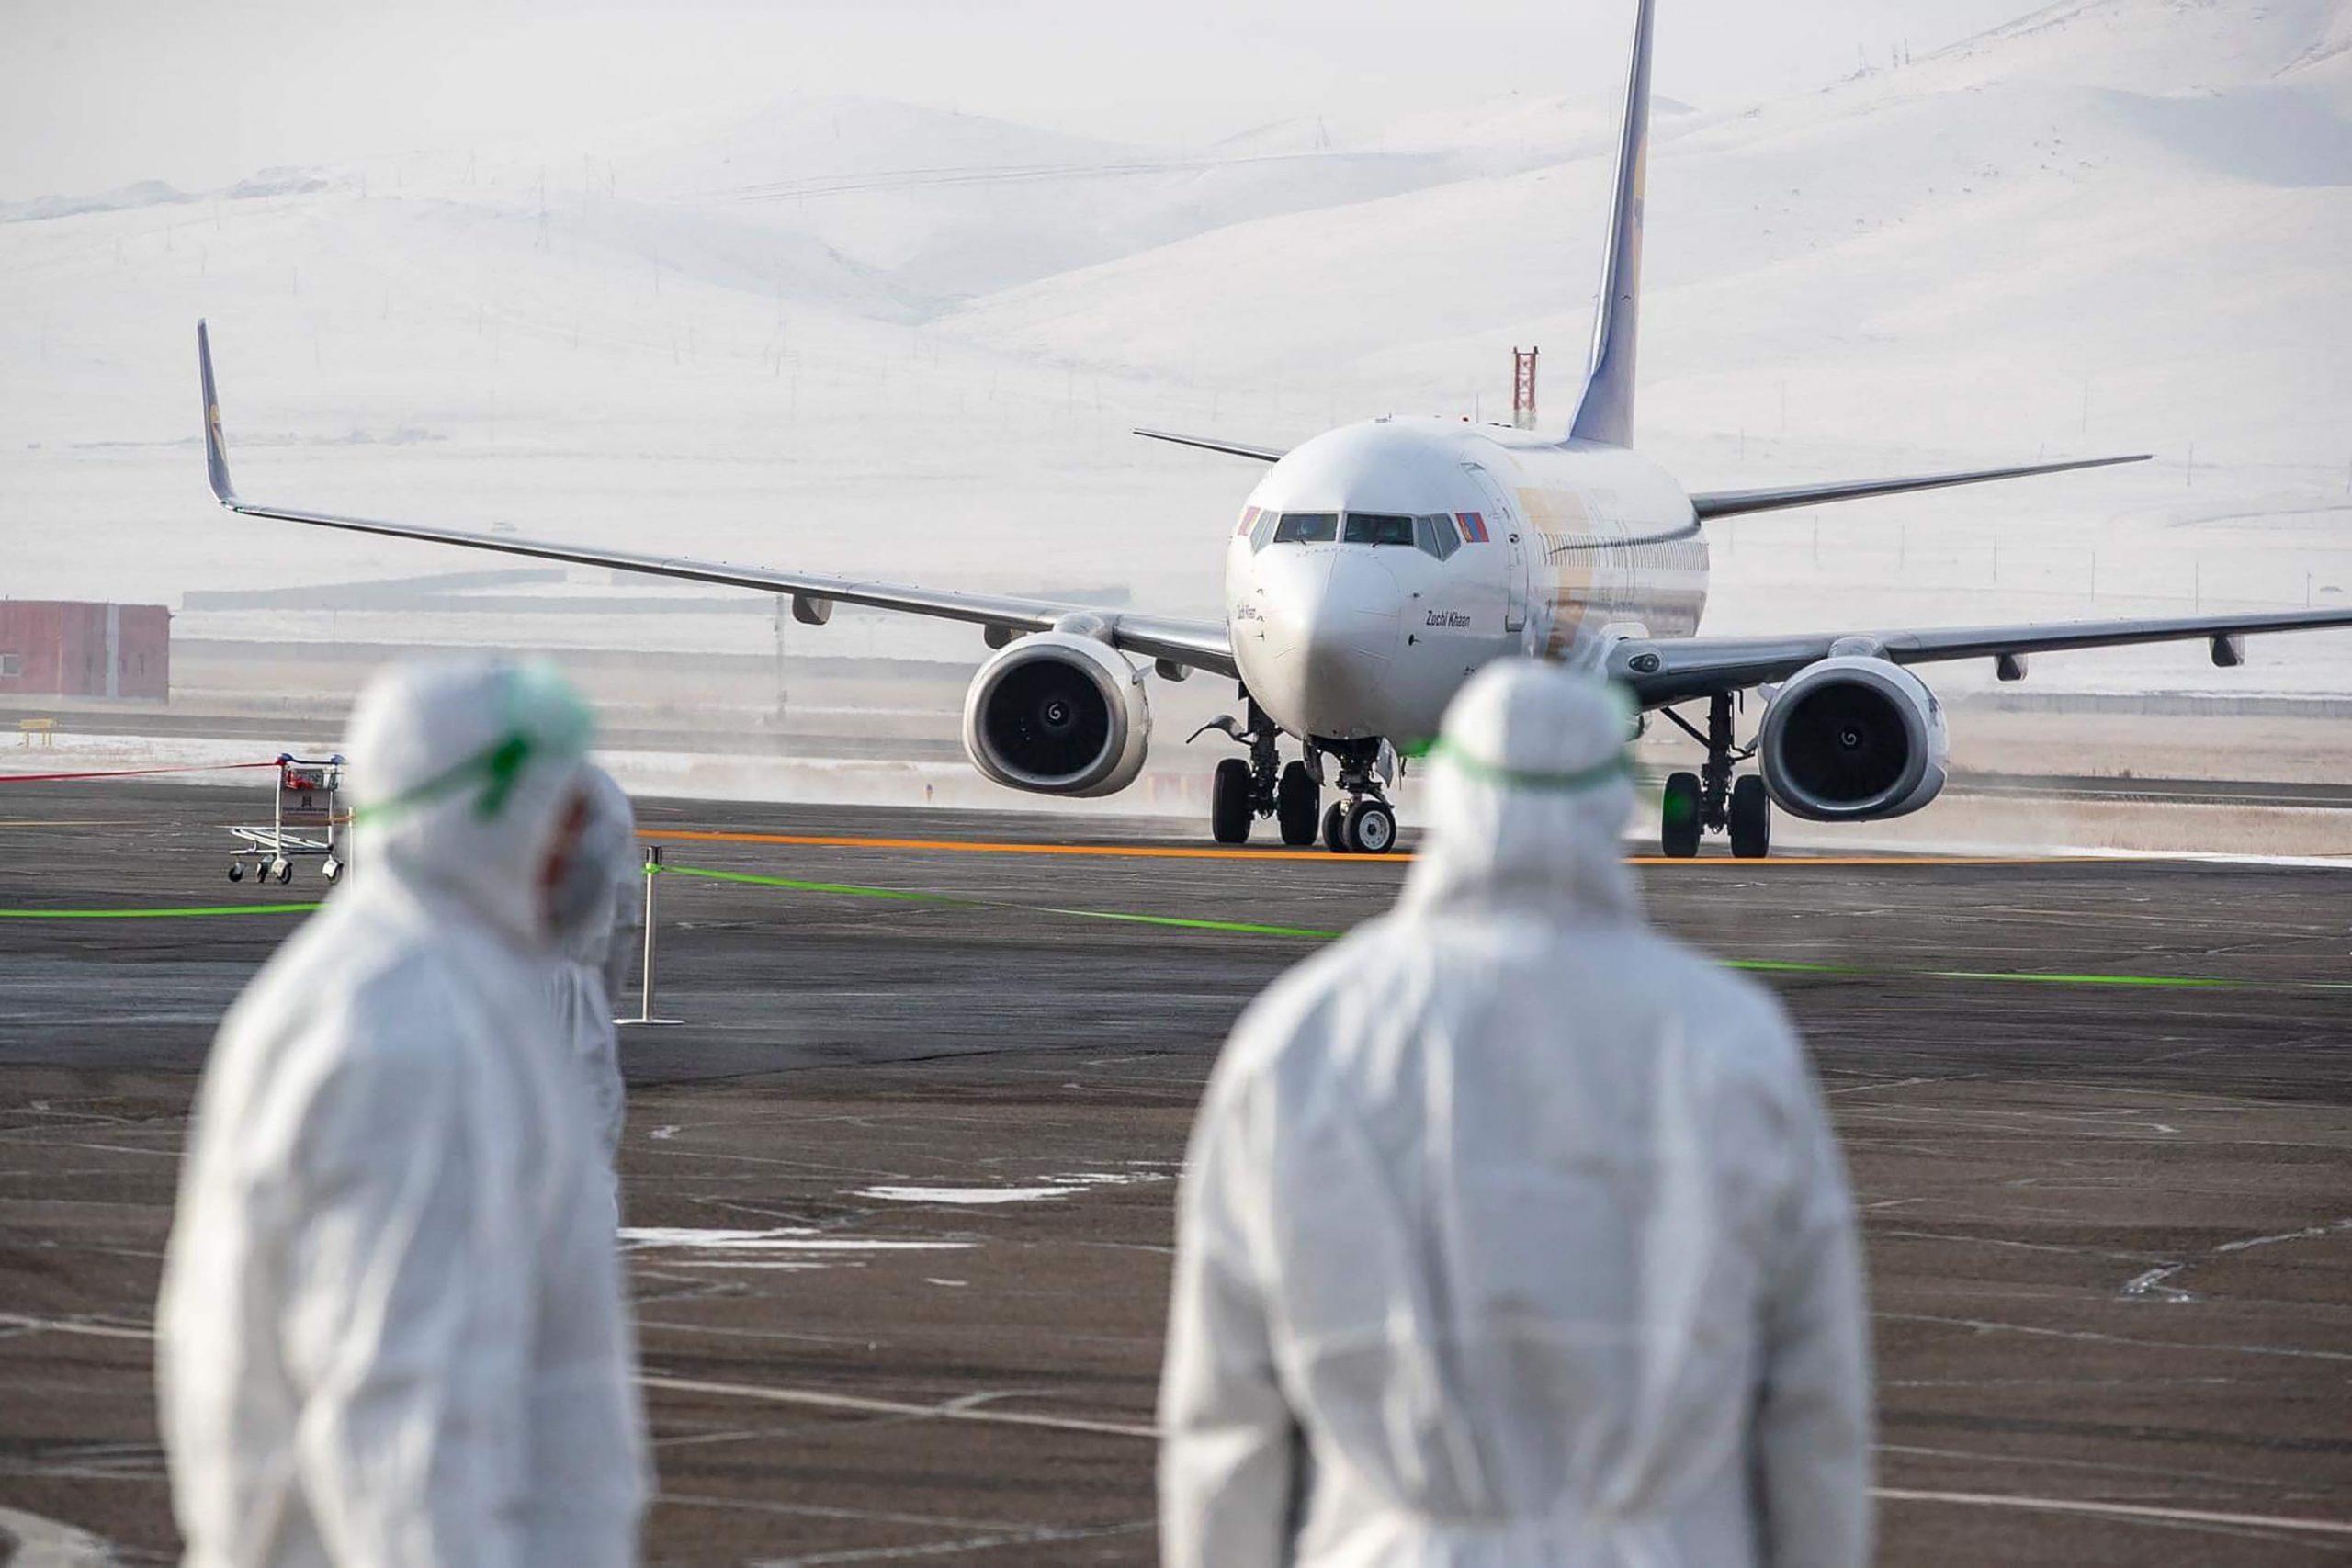 China adjusts plans for international passenger flights